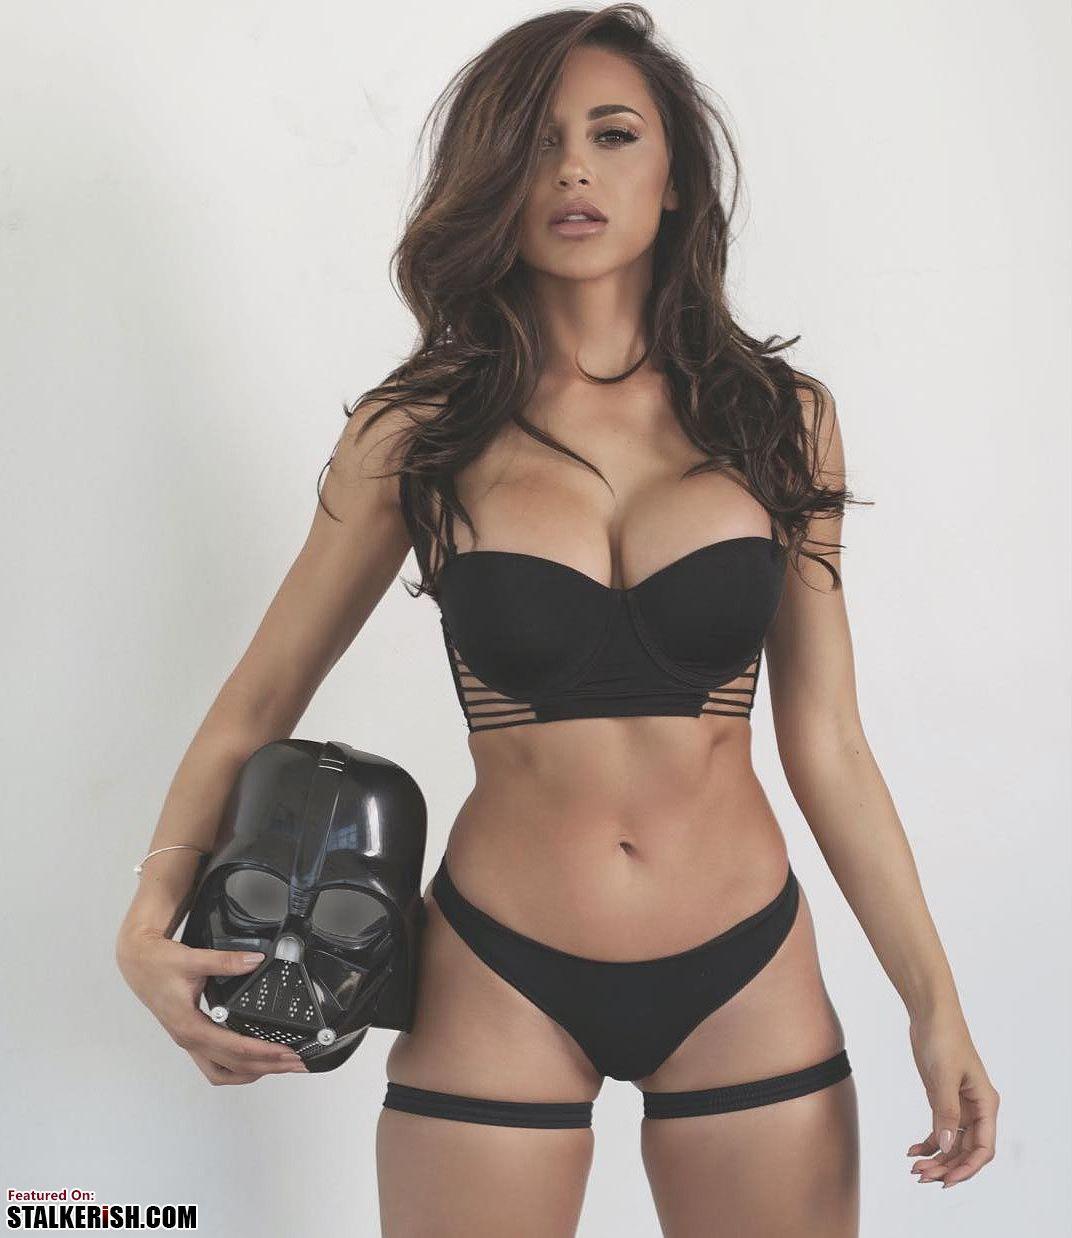 Ana Carolina Playboy ana cheri star wars - #anacheri #darthvader #playboy